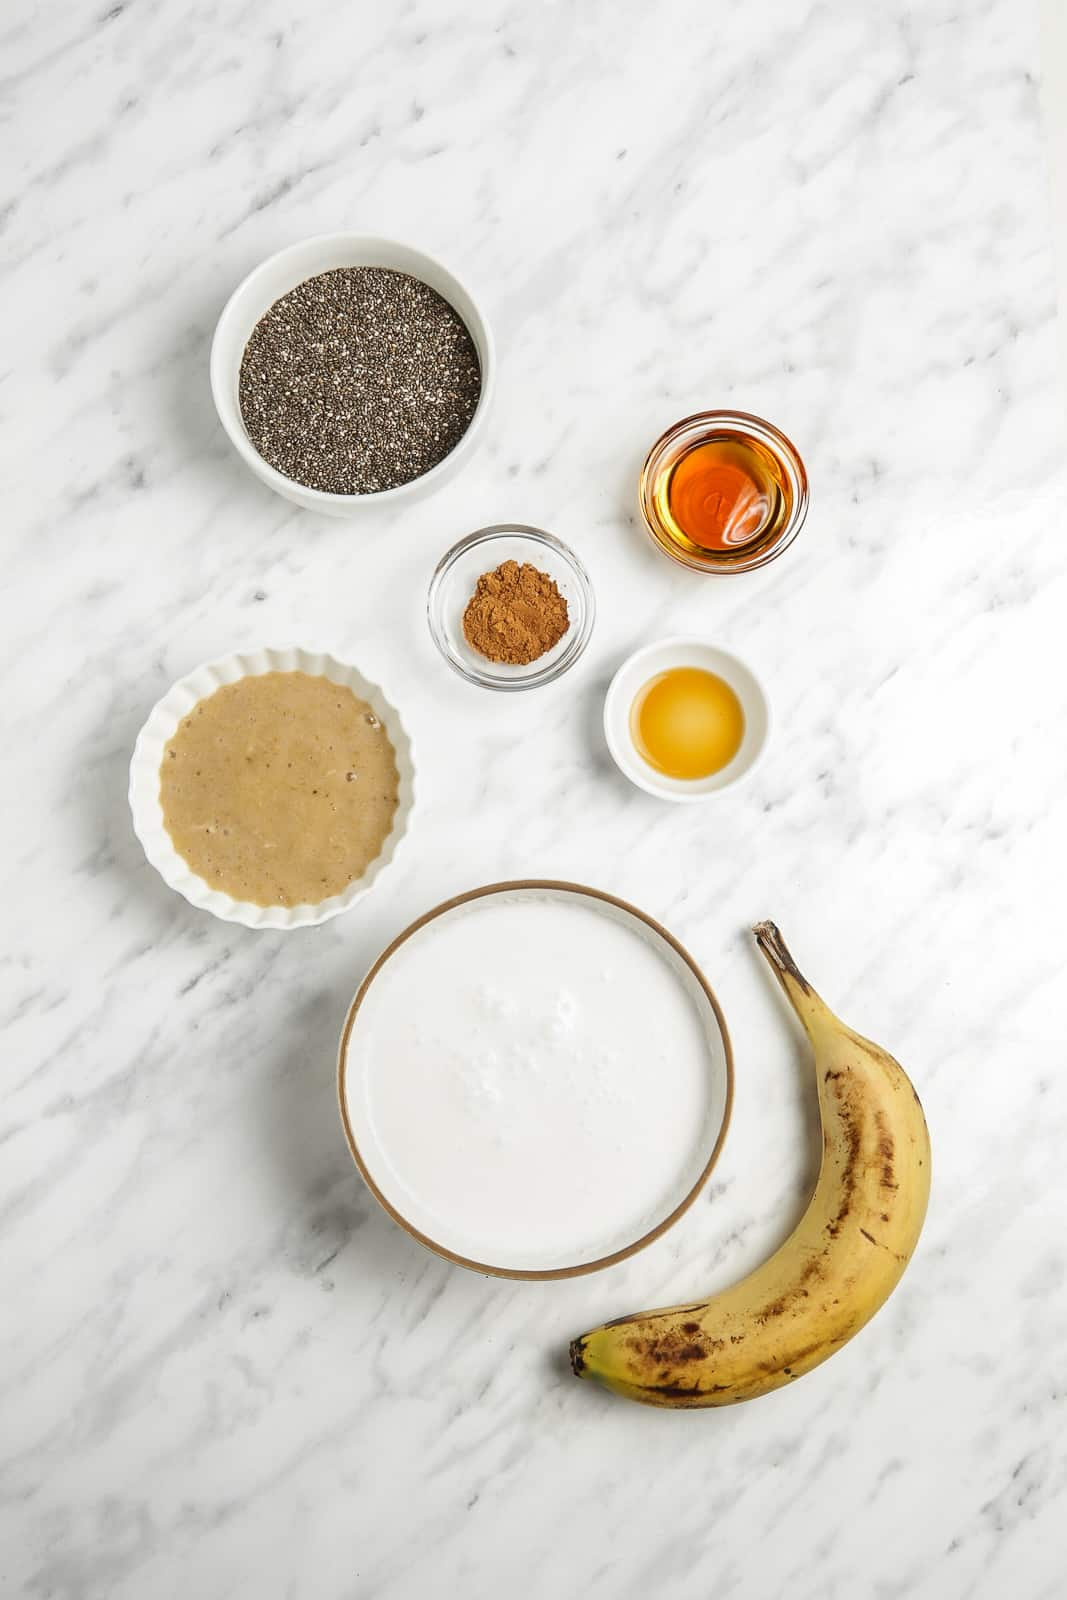 Bowls of chia seeds, maple syrup, coconut milk, vanilla syrup, cinnamon,  and mashed banana with a fresh banana